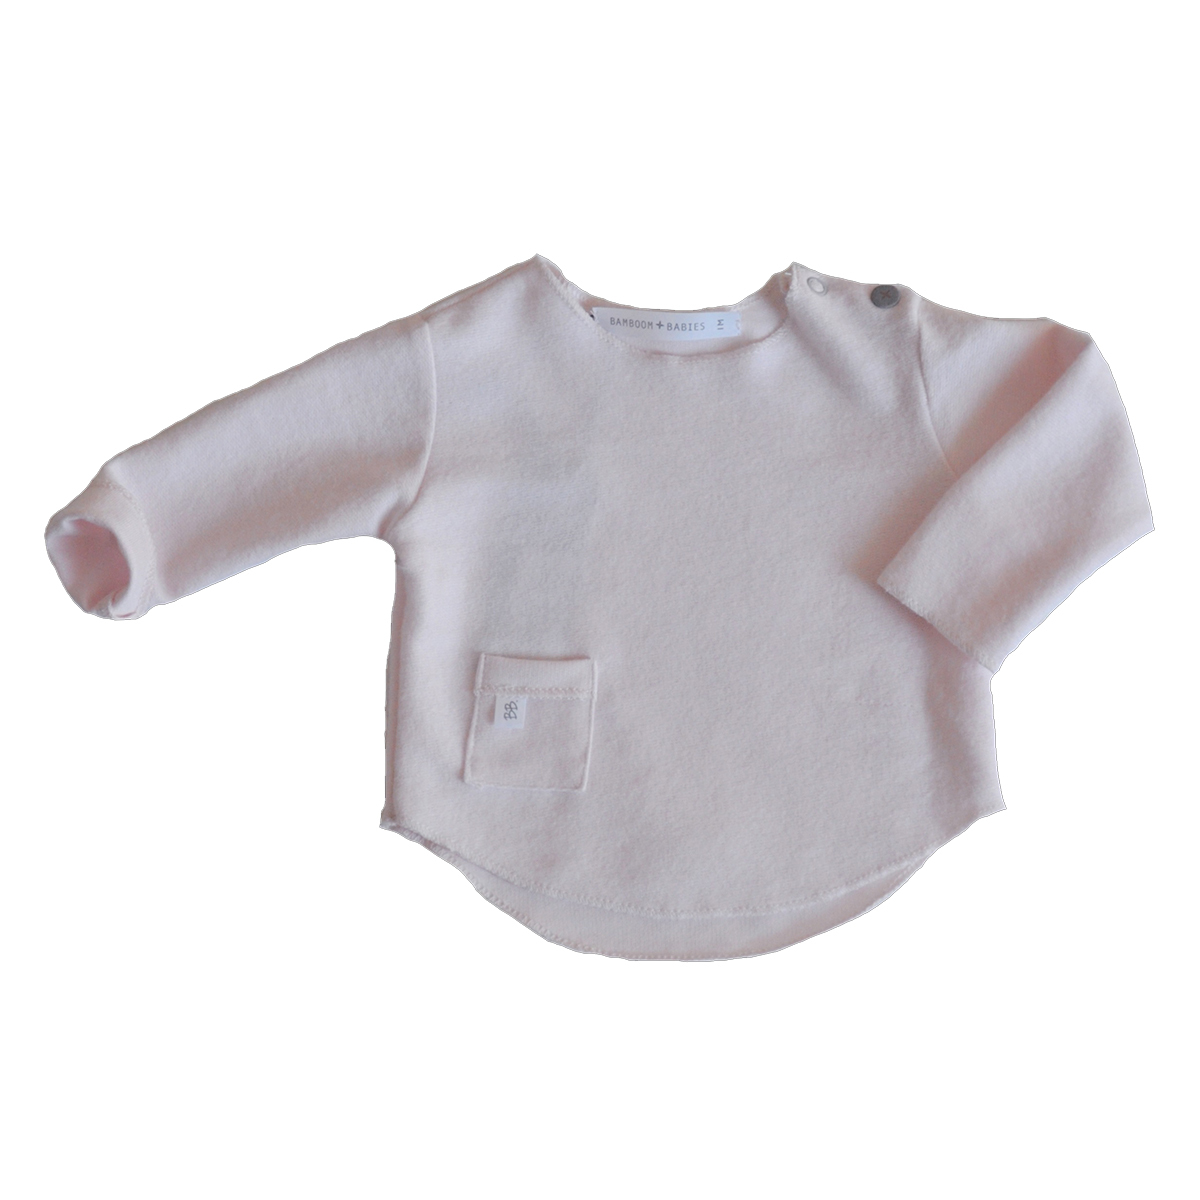 Haut bébé Tee-Shirt Manches Longues Rose - 3 Mois Tee-Shirt Manches Longues Rose - 3 Mois